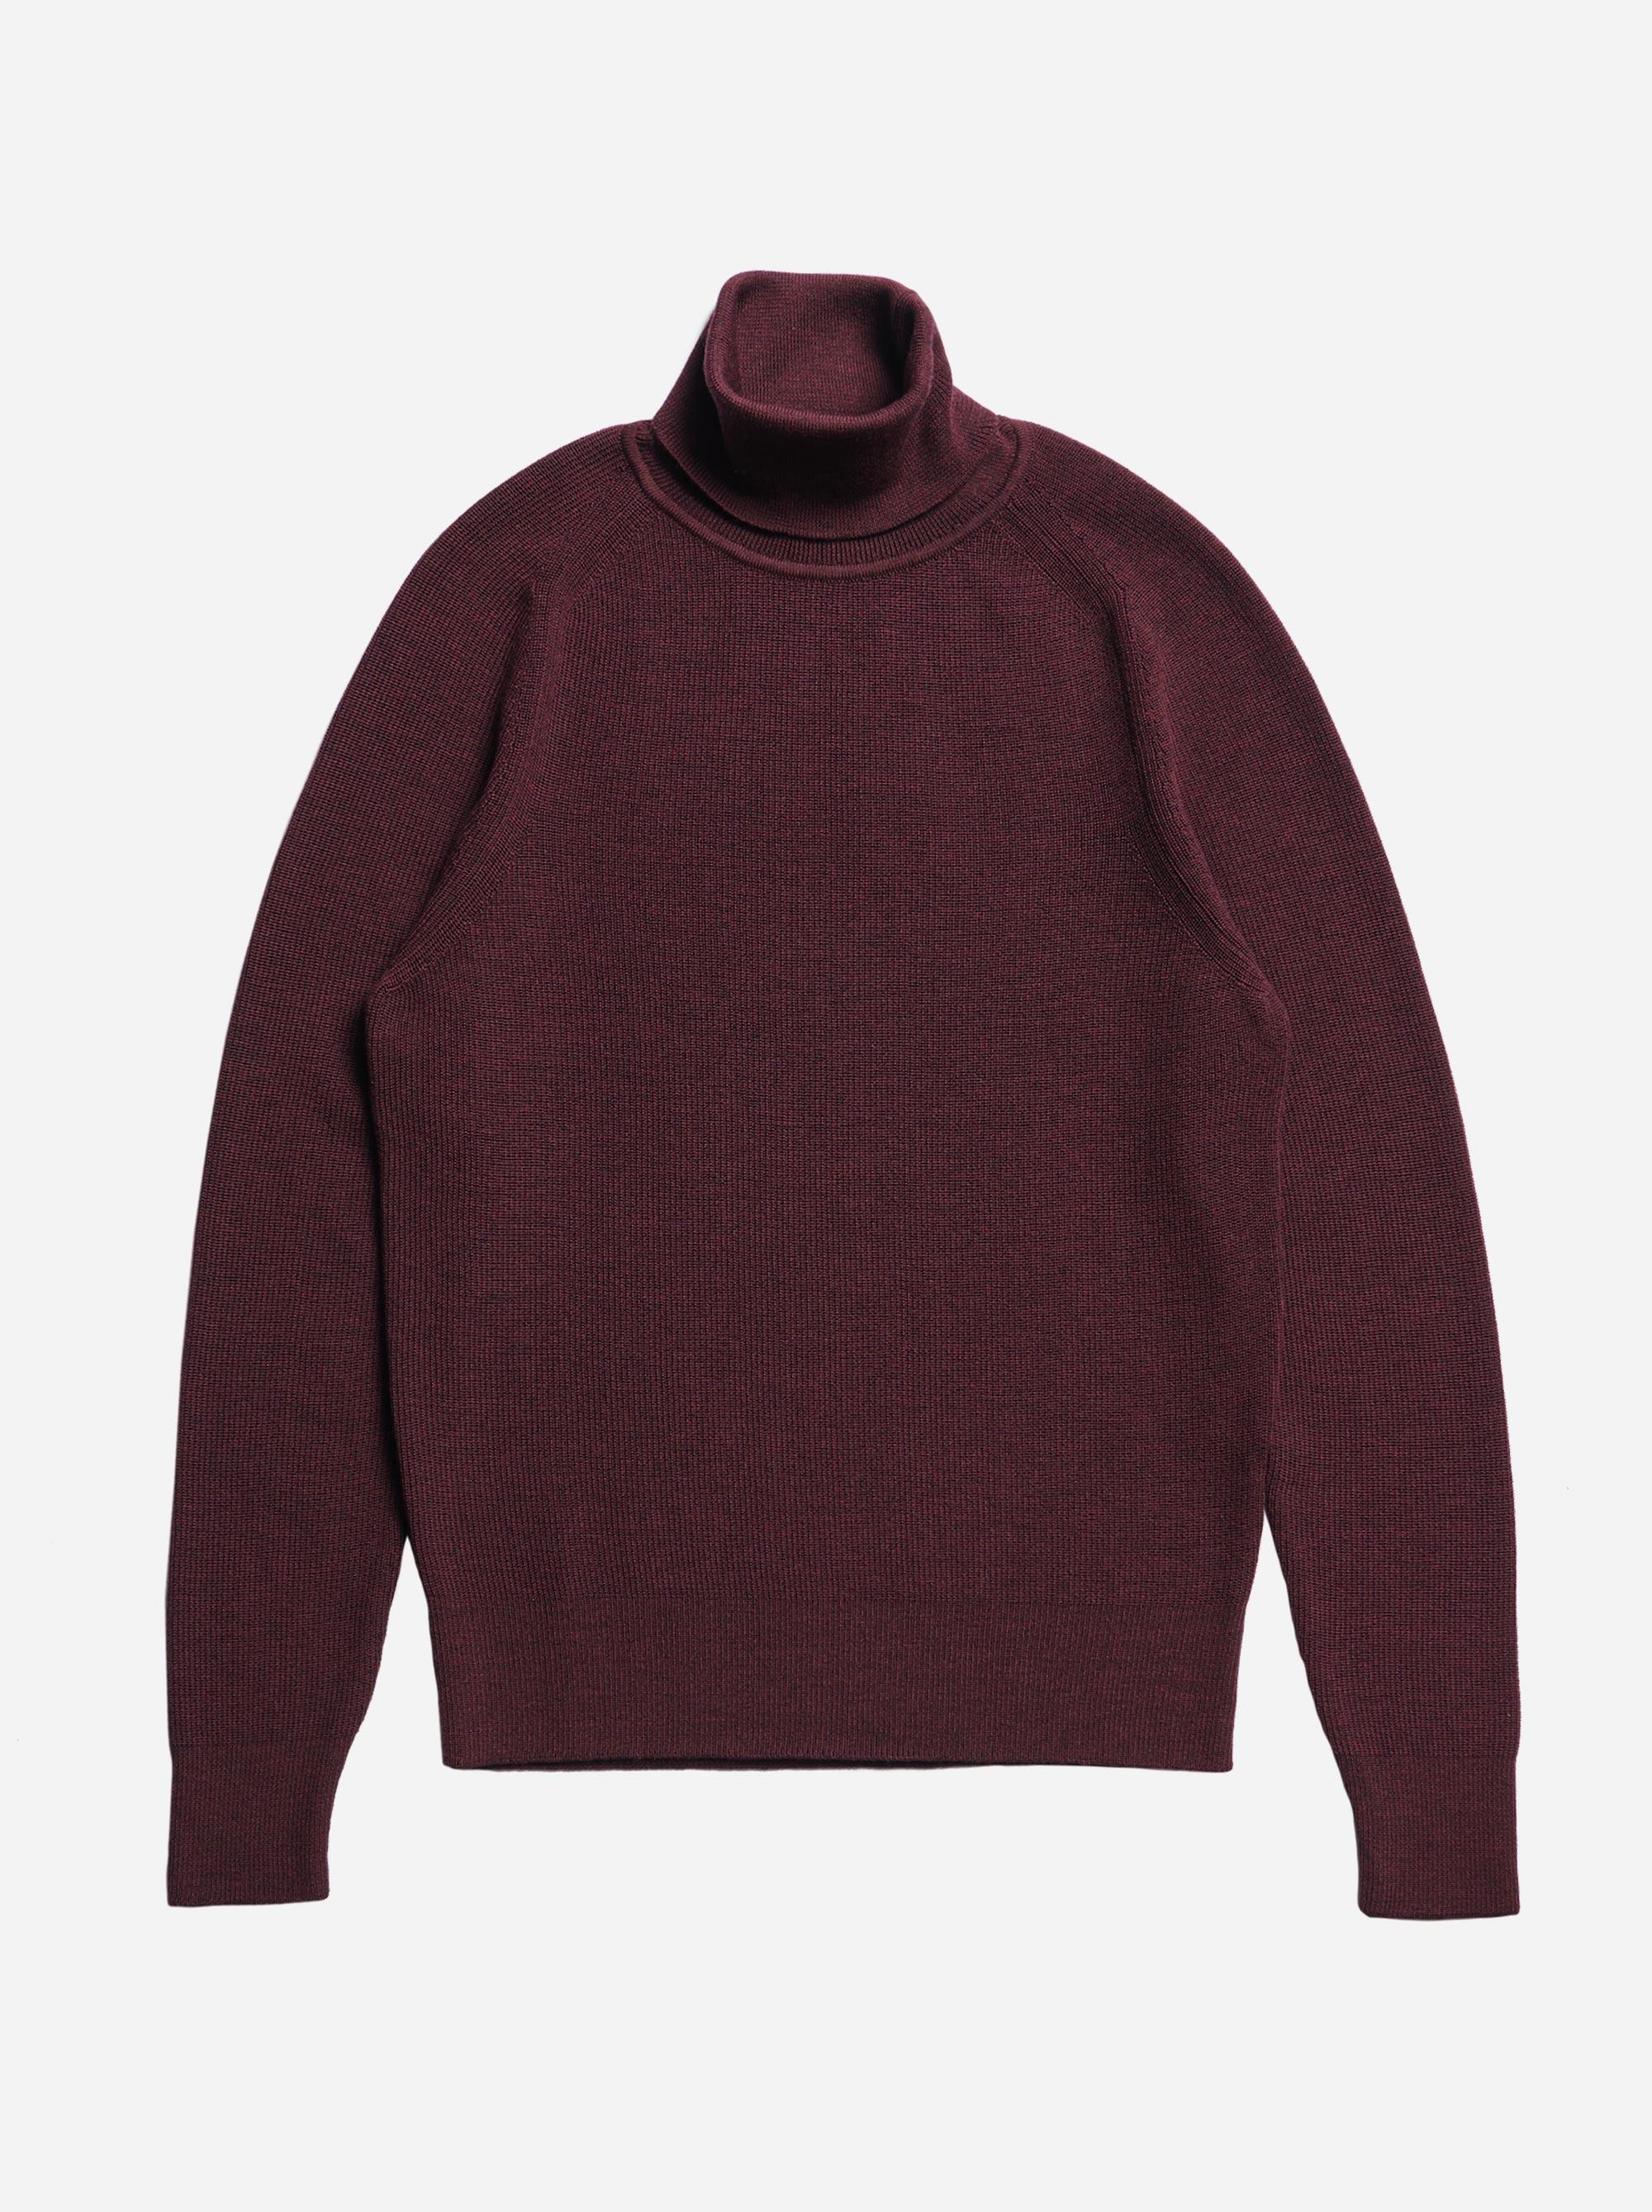 Teym - Turtleneck - The Merino Sweater - Men - Burgundy - 5